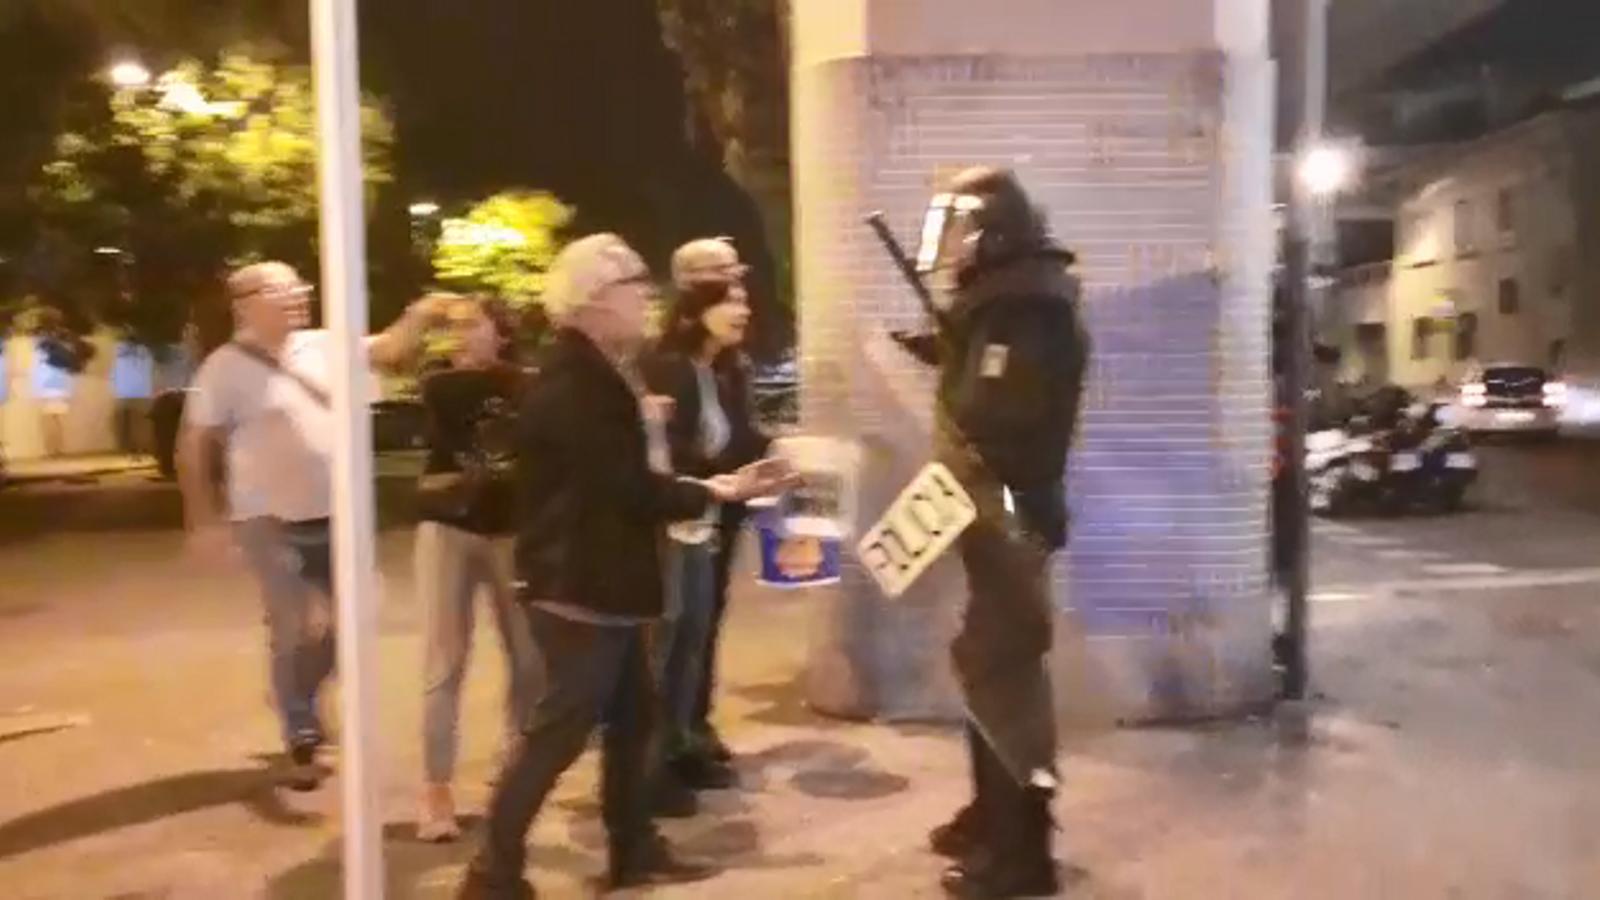 La policia s'emporta un manifestant que apagava un foc / ARA